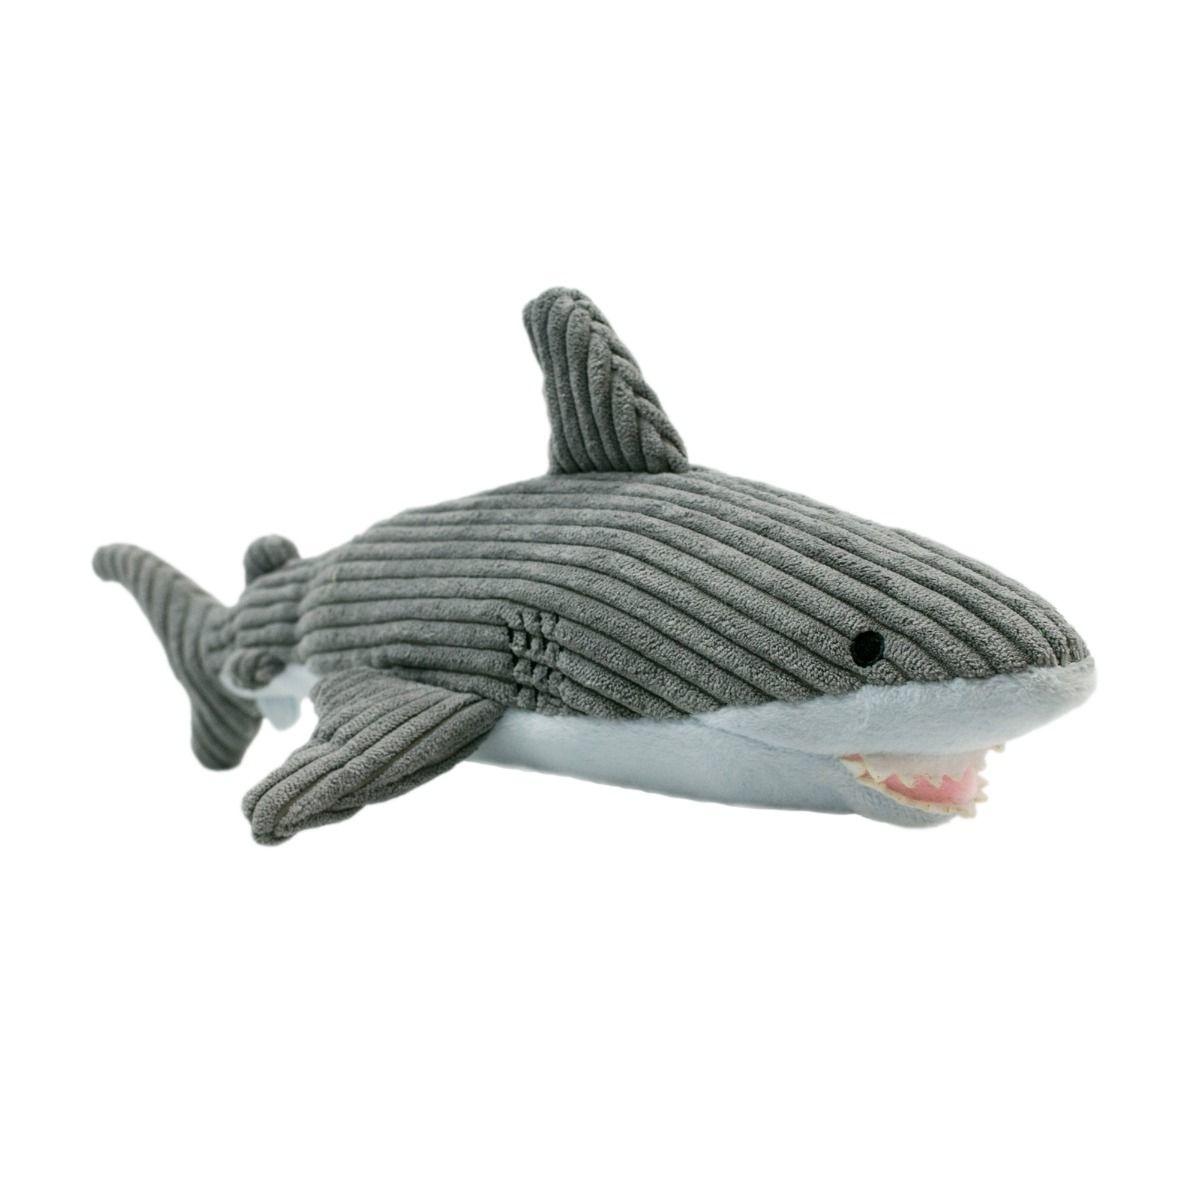 "Tall Tails Tall Tails Plush Shark Toy 12"""